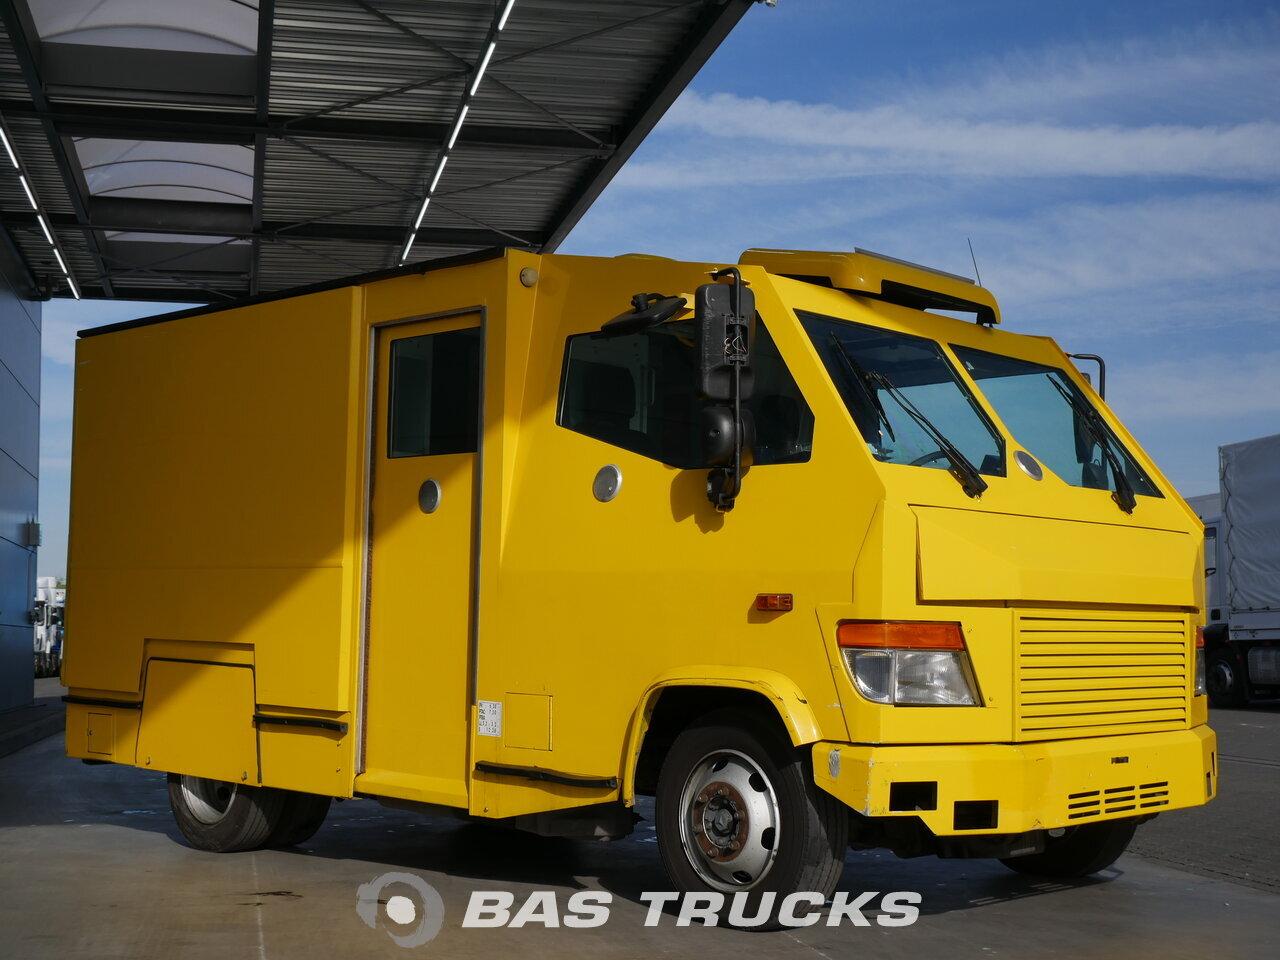 Mercedes Vario Occasion : mercedes 813d vario camion euro 4 12200 bas trucks ~ Medecine-chirurgie-esthetiques.com Avis de Voitures